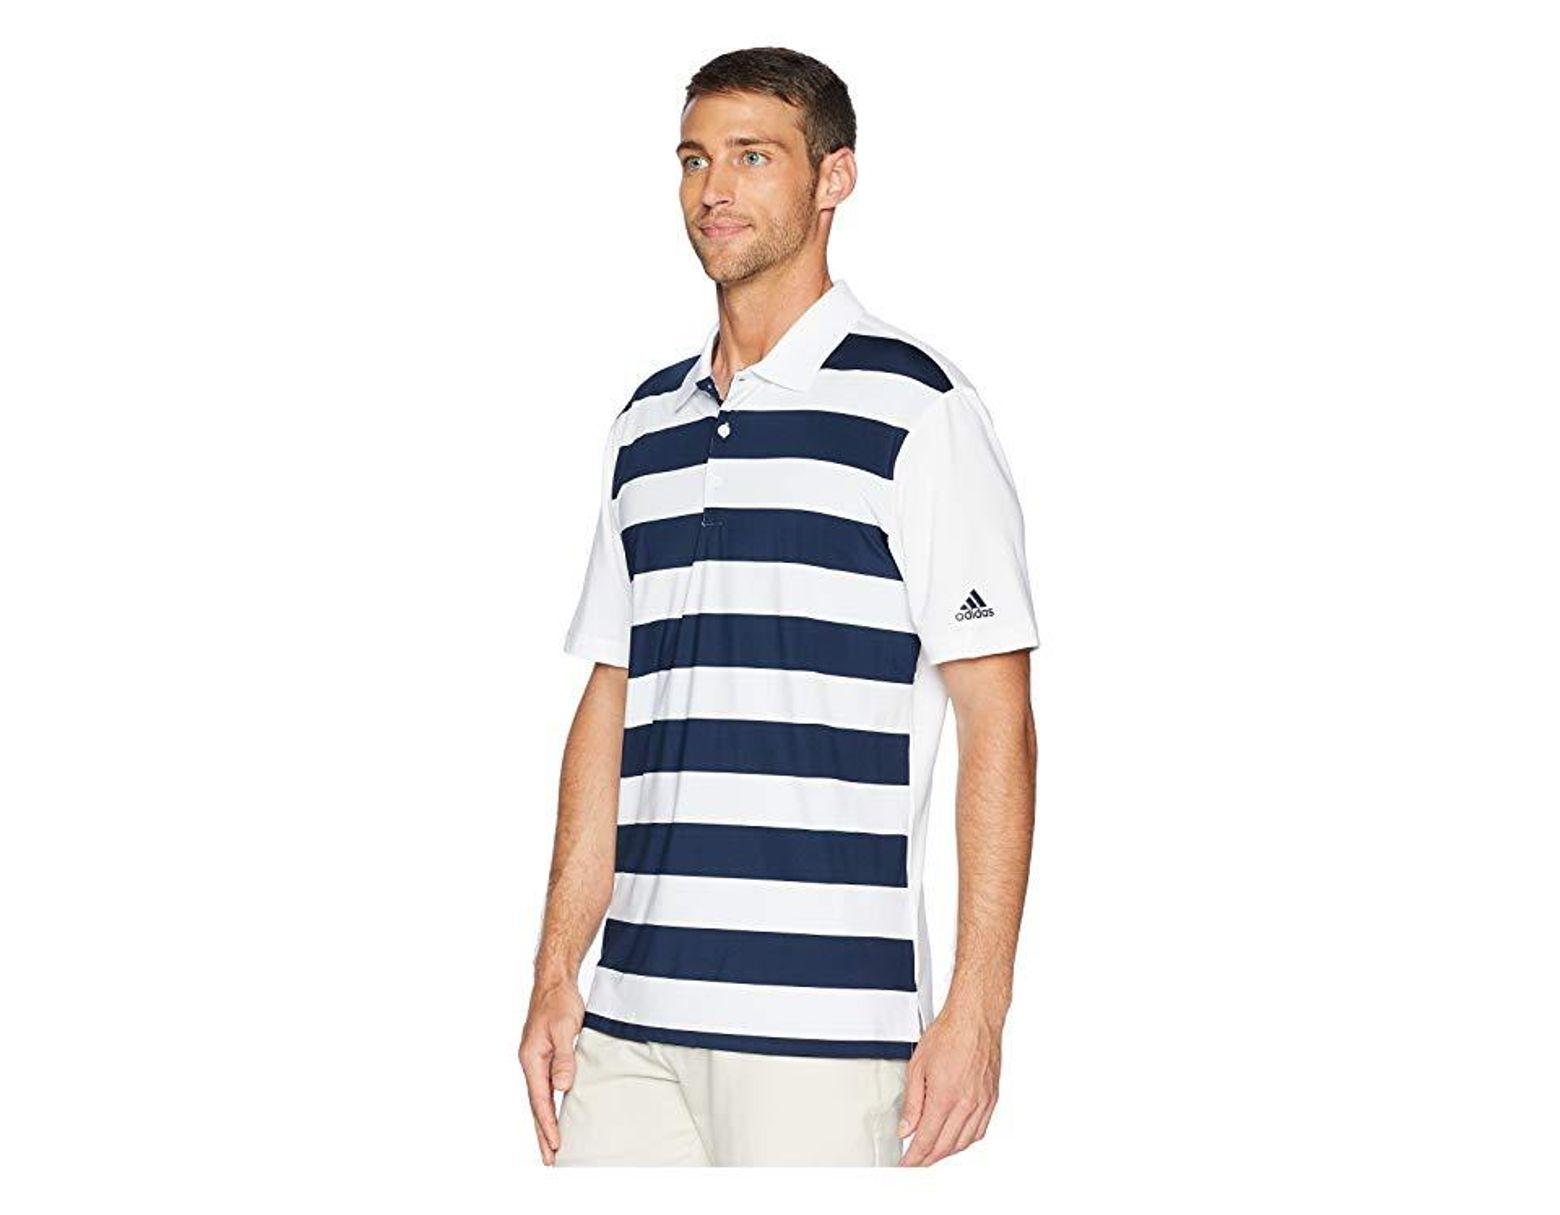 Rugby Adidas Originals Stripe Ultimate Navy Polowhitecollegiate 7fb6yg